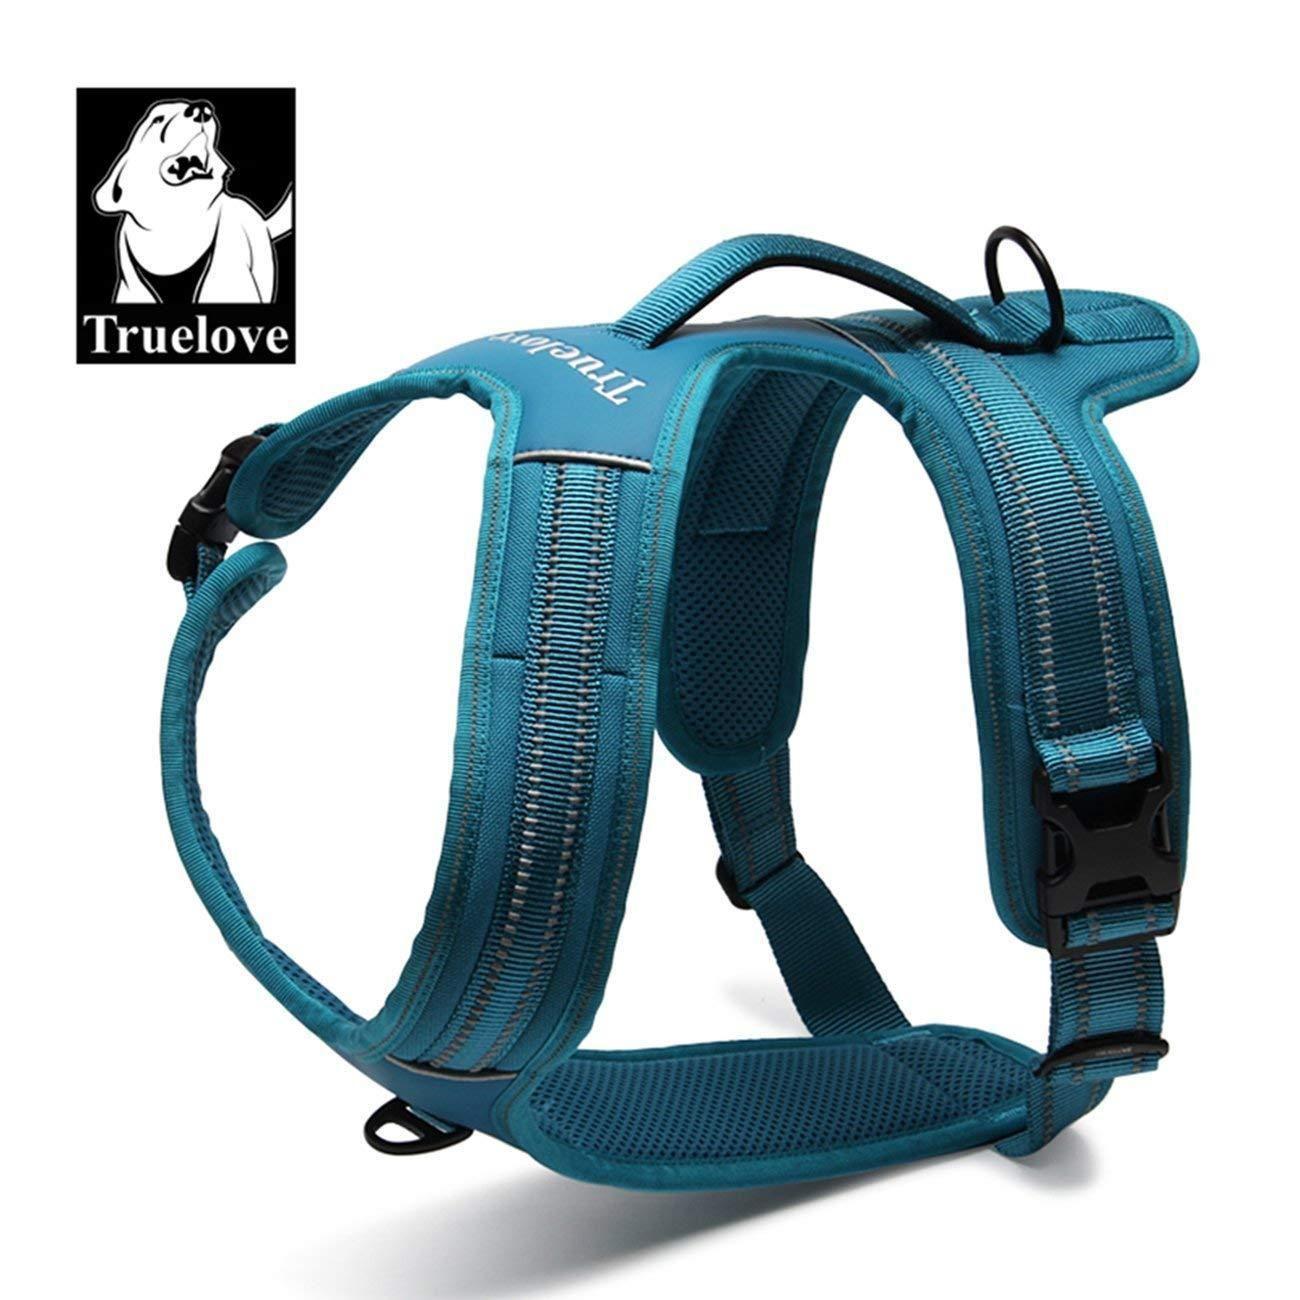 Truelove Hybrid No Pull Heavy Duty Dog Harness W Shoulder